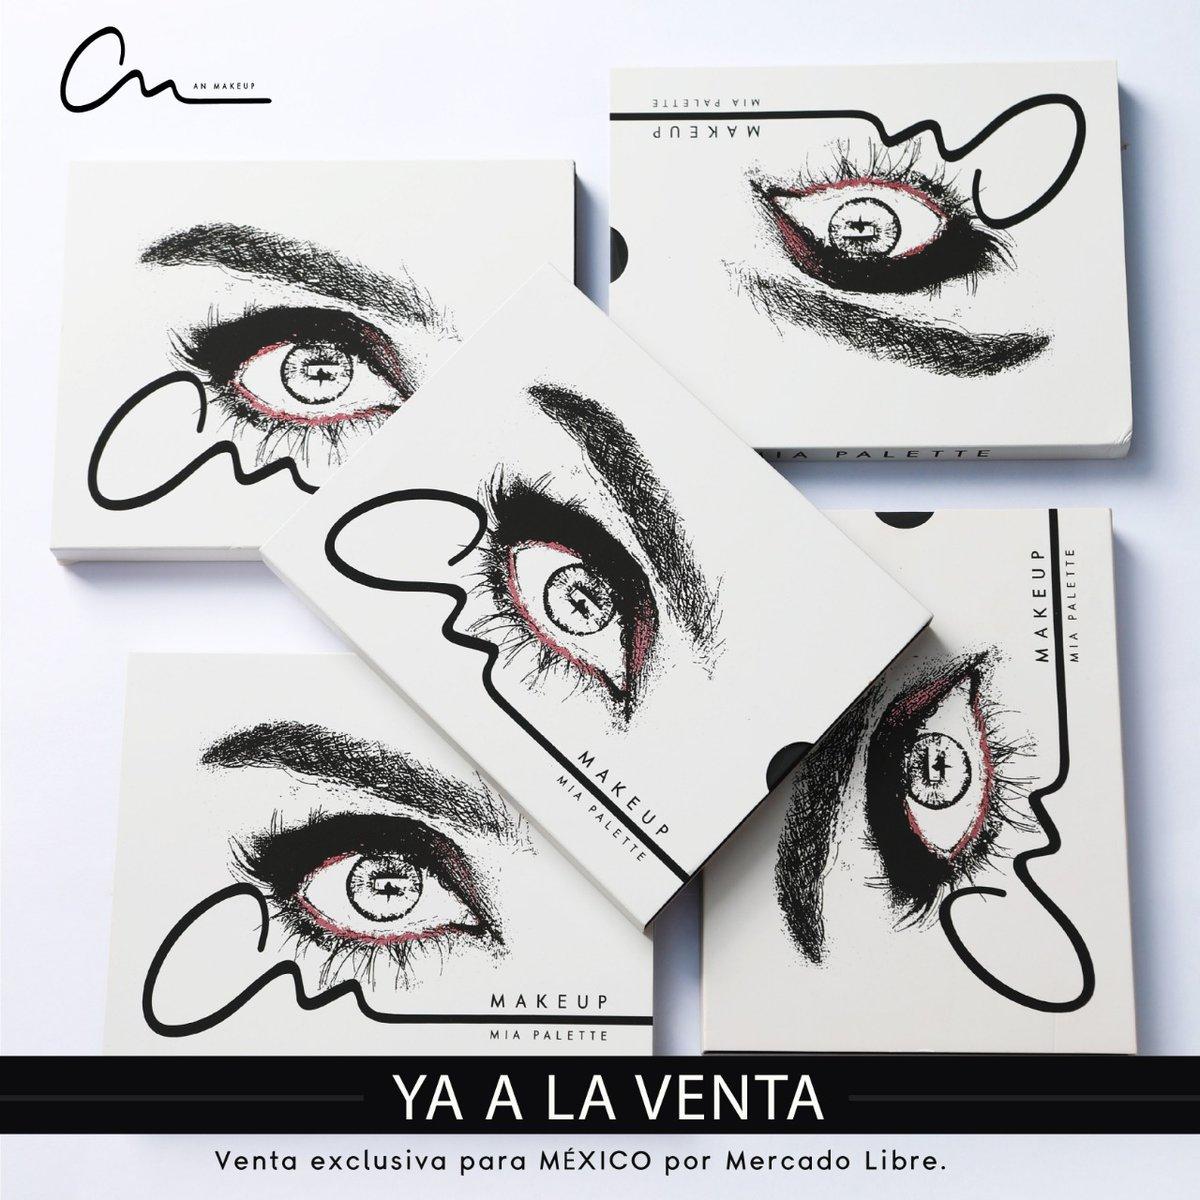 Llegó la NAVIDAD 🎄 ¡La ⭐ de tu makeup hoy será MIA PALETTE!  Venta exclusiva @ML_Mexico #BecomeYourDream #anmakeup1111 . . . . . . #makeuplovers #makeupartists #makeupdreamers #makeup #eyeshadows #anahi